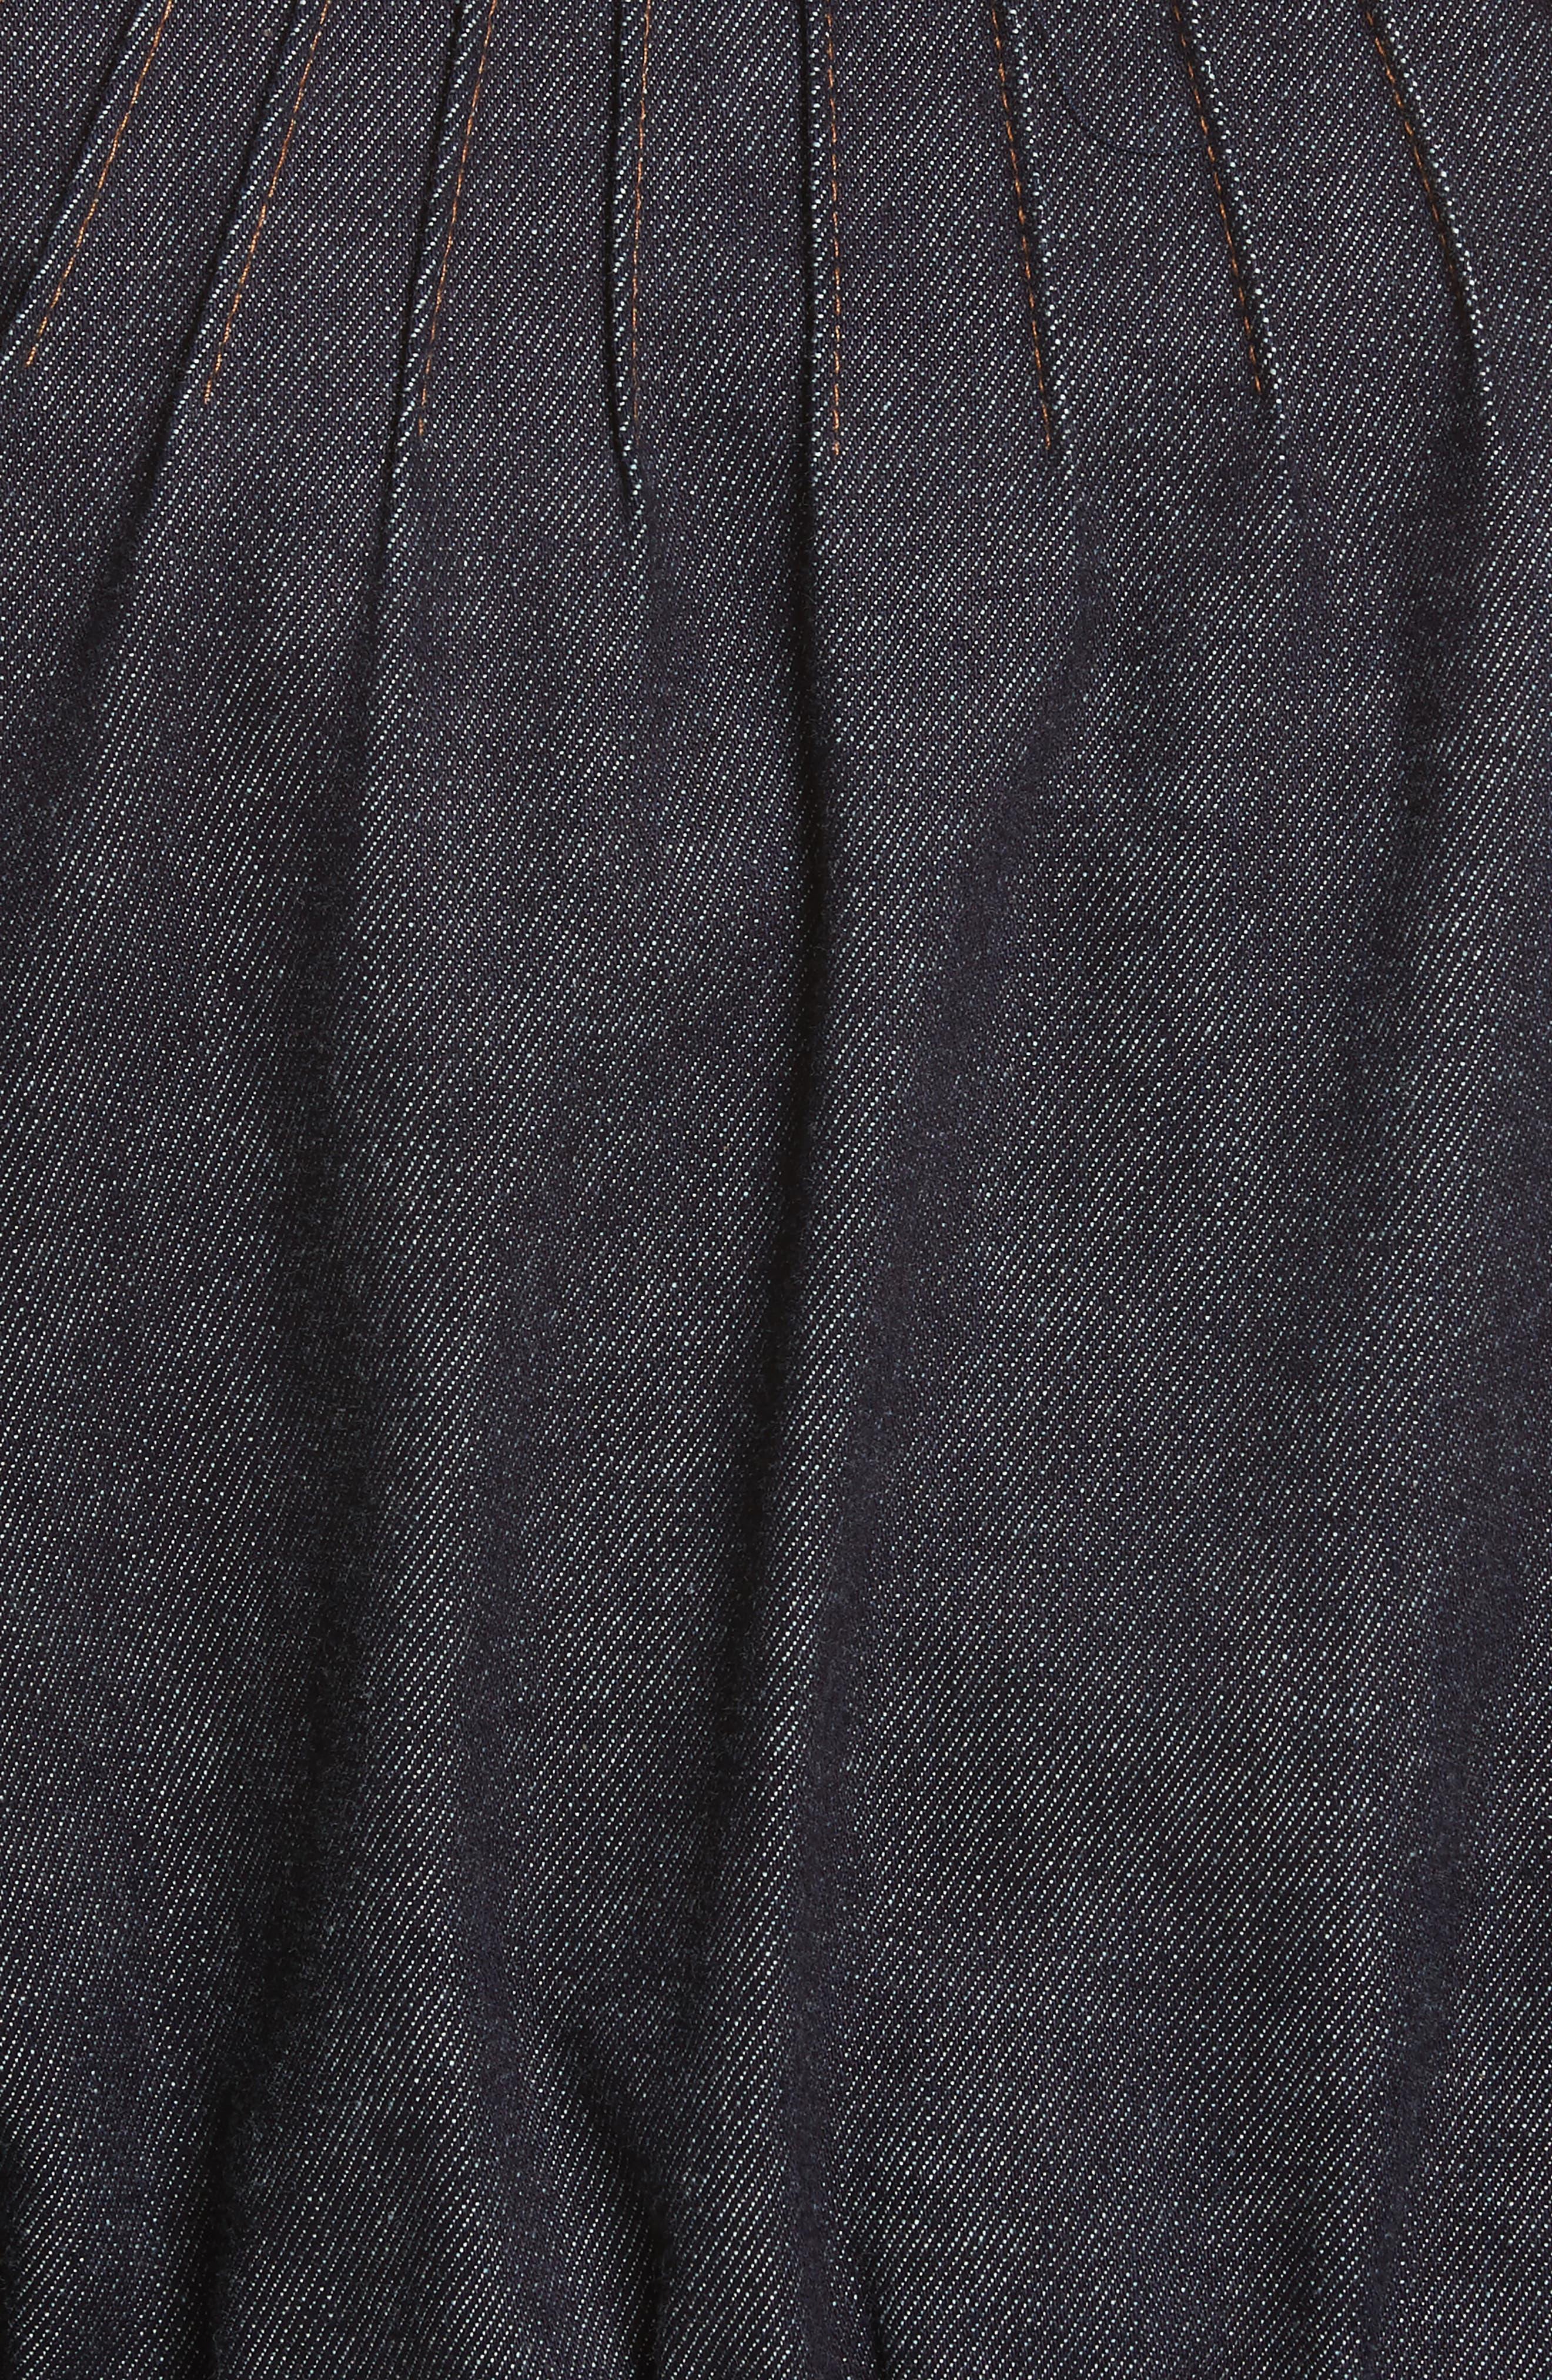 Diane von Furstenberg Pintuck Denim Jacket,                             Alternate thumbnail 6, color,                             400